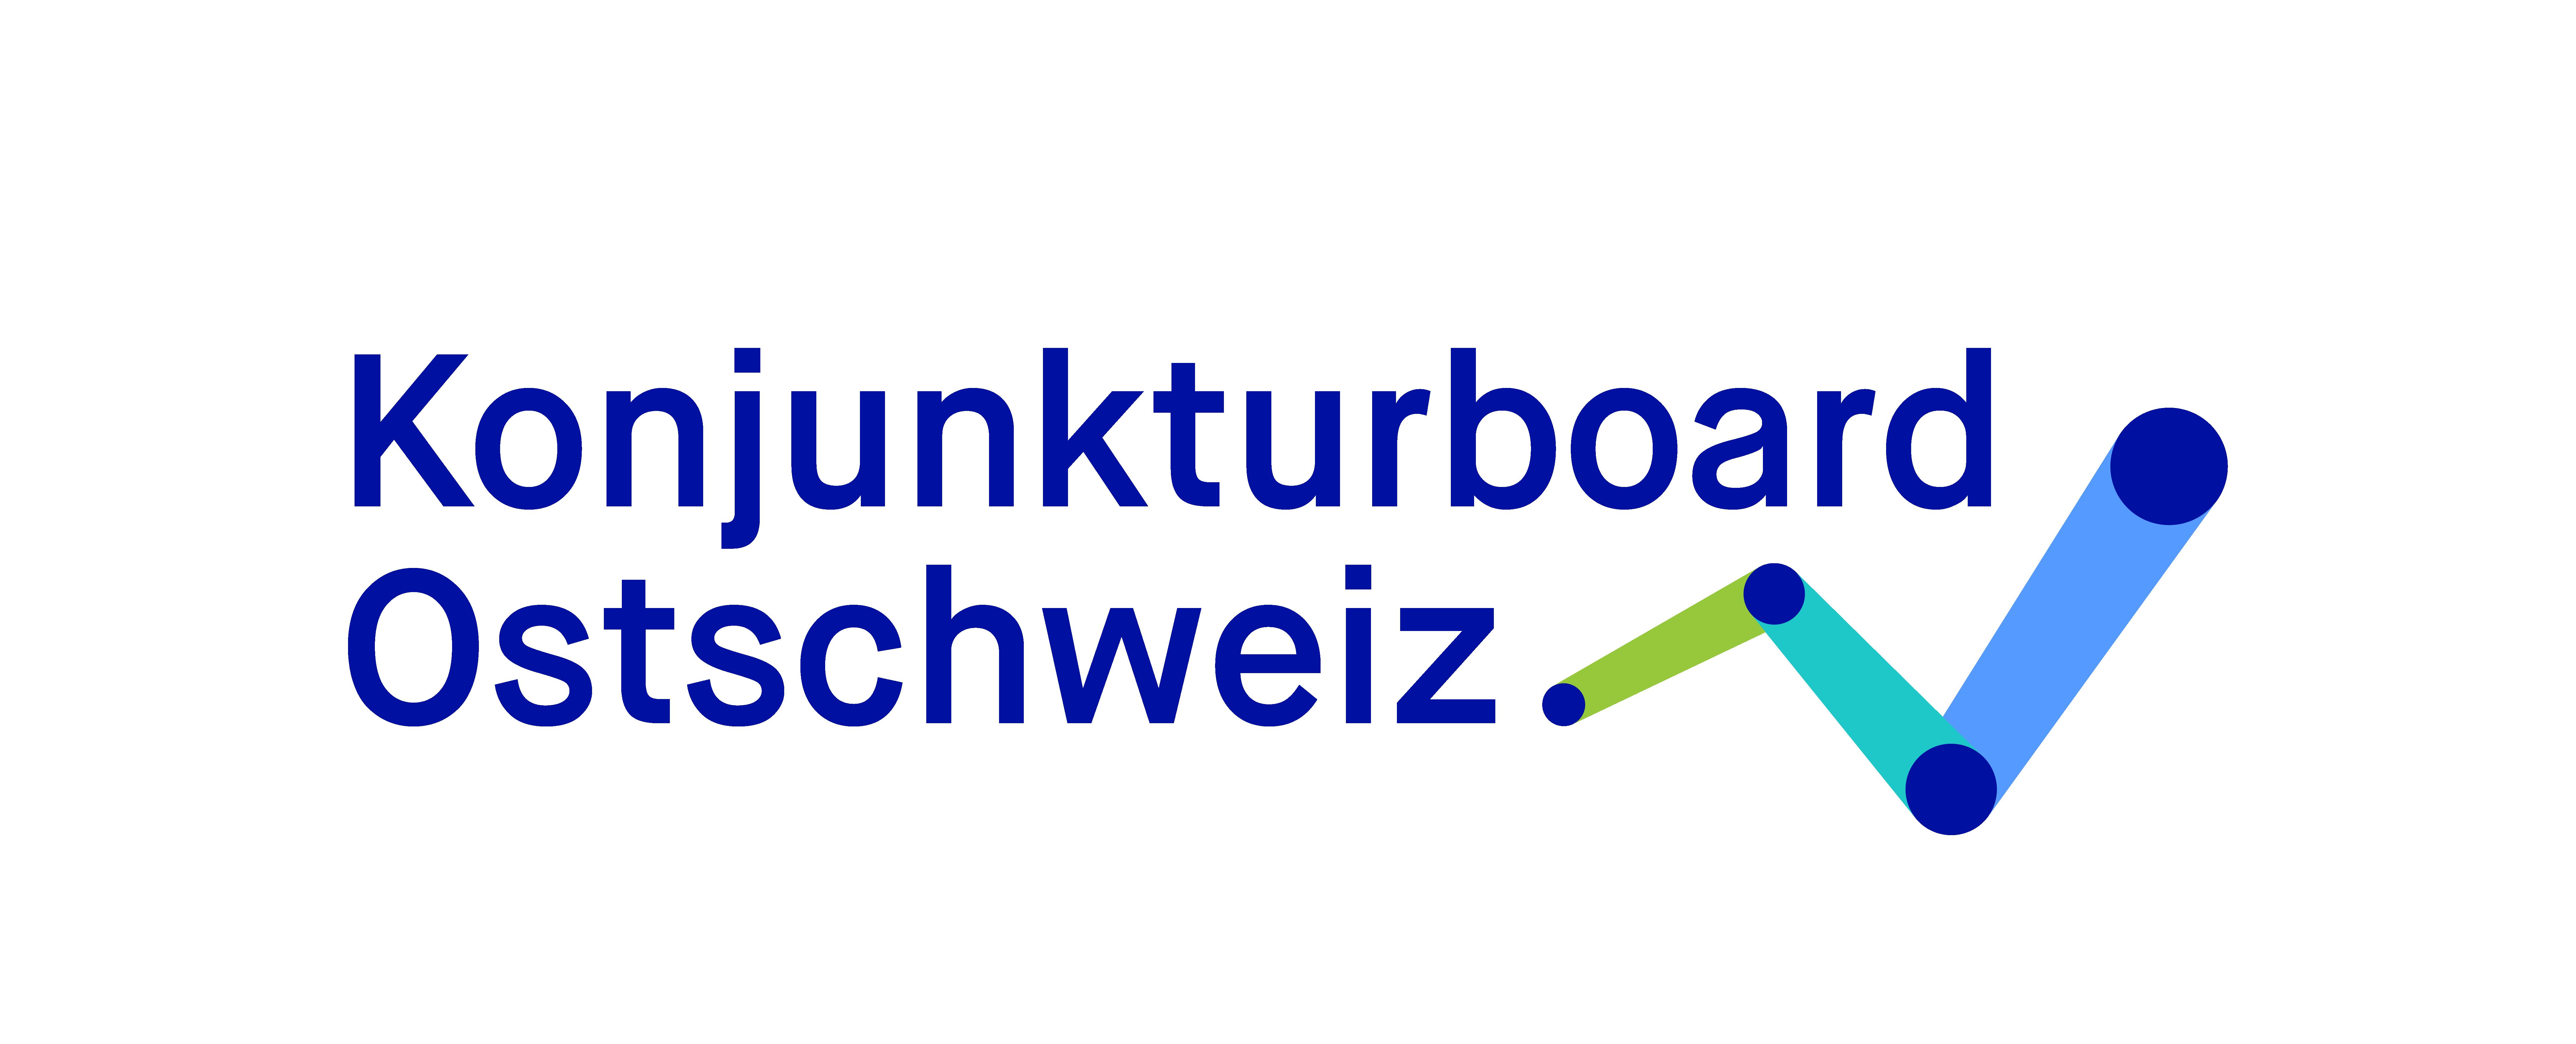 Konjunkturboard Ostschweiz Logo